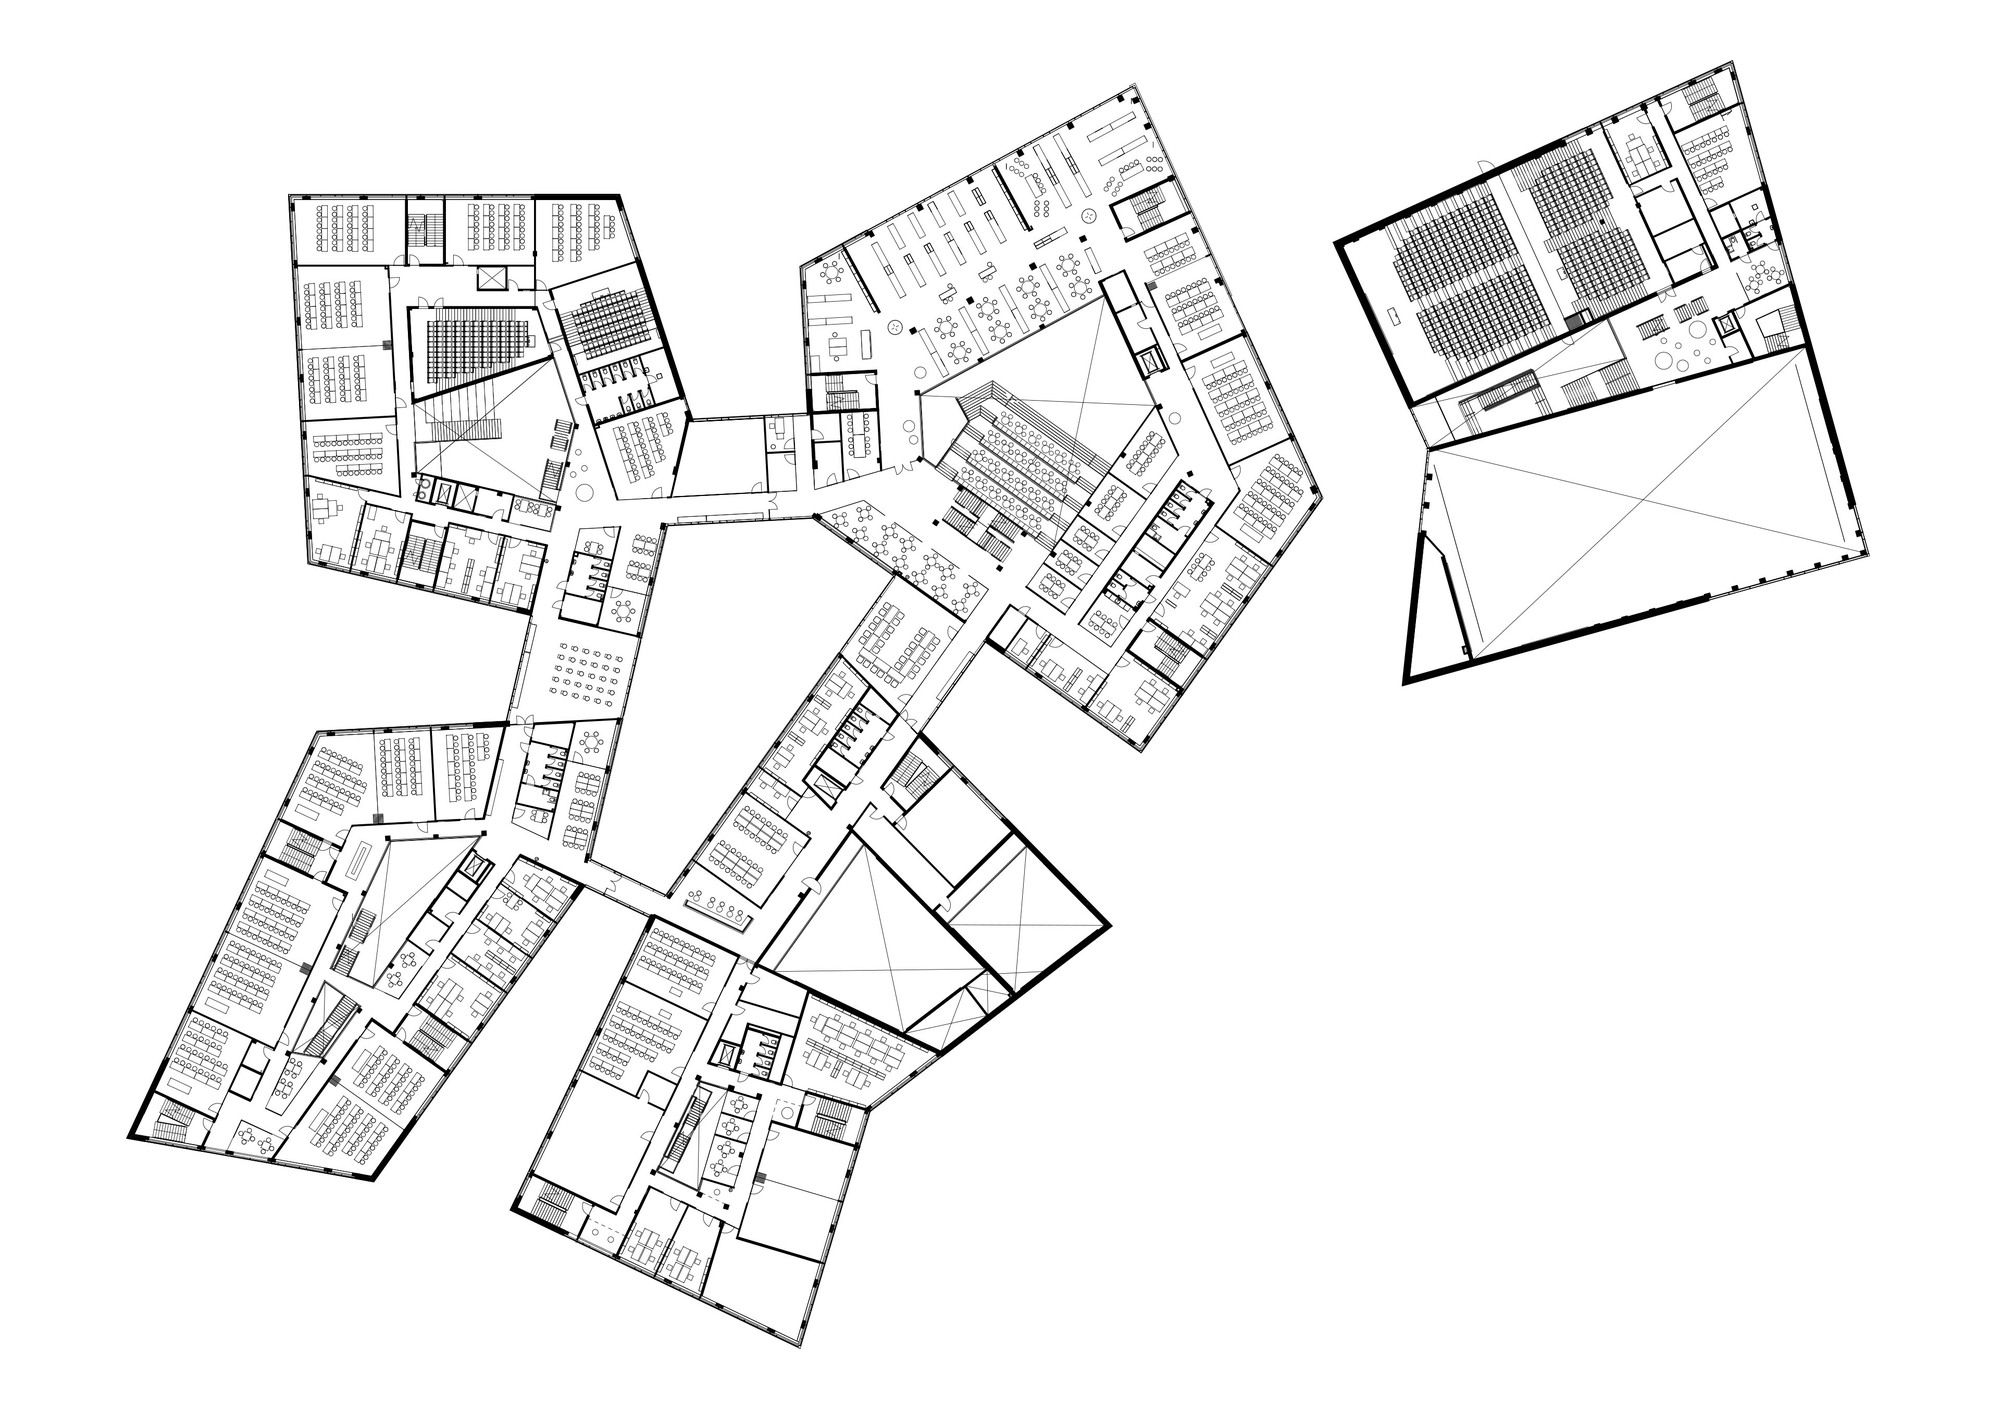 Image 22 of 27 from gallery of via university college aarhus city arkitema architects floor plan